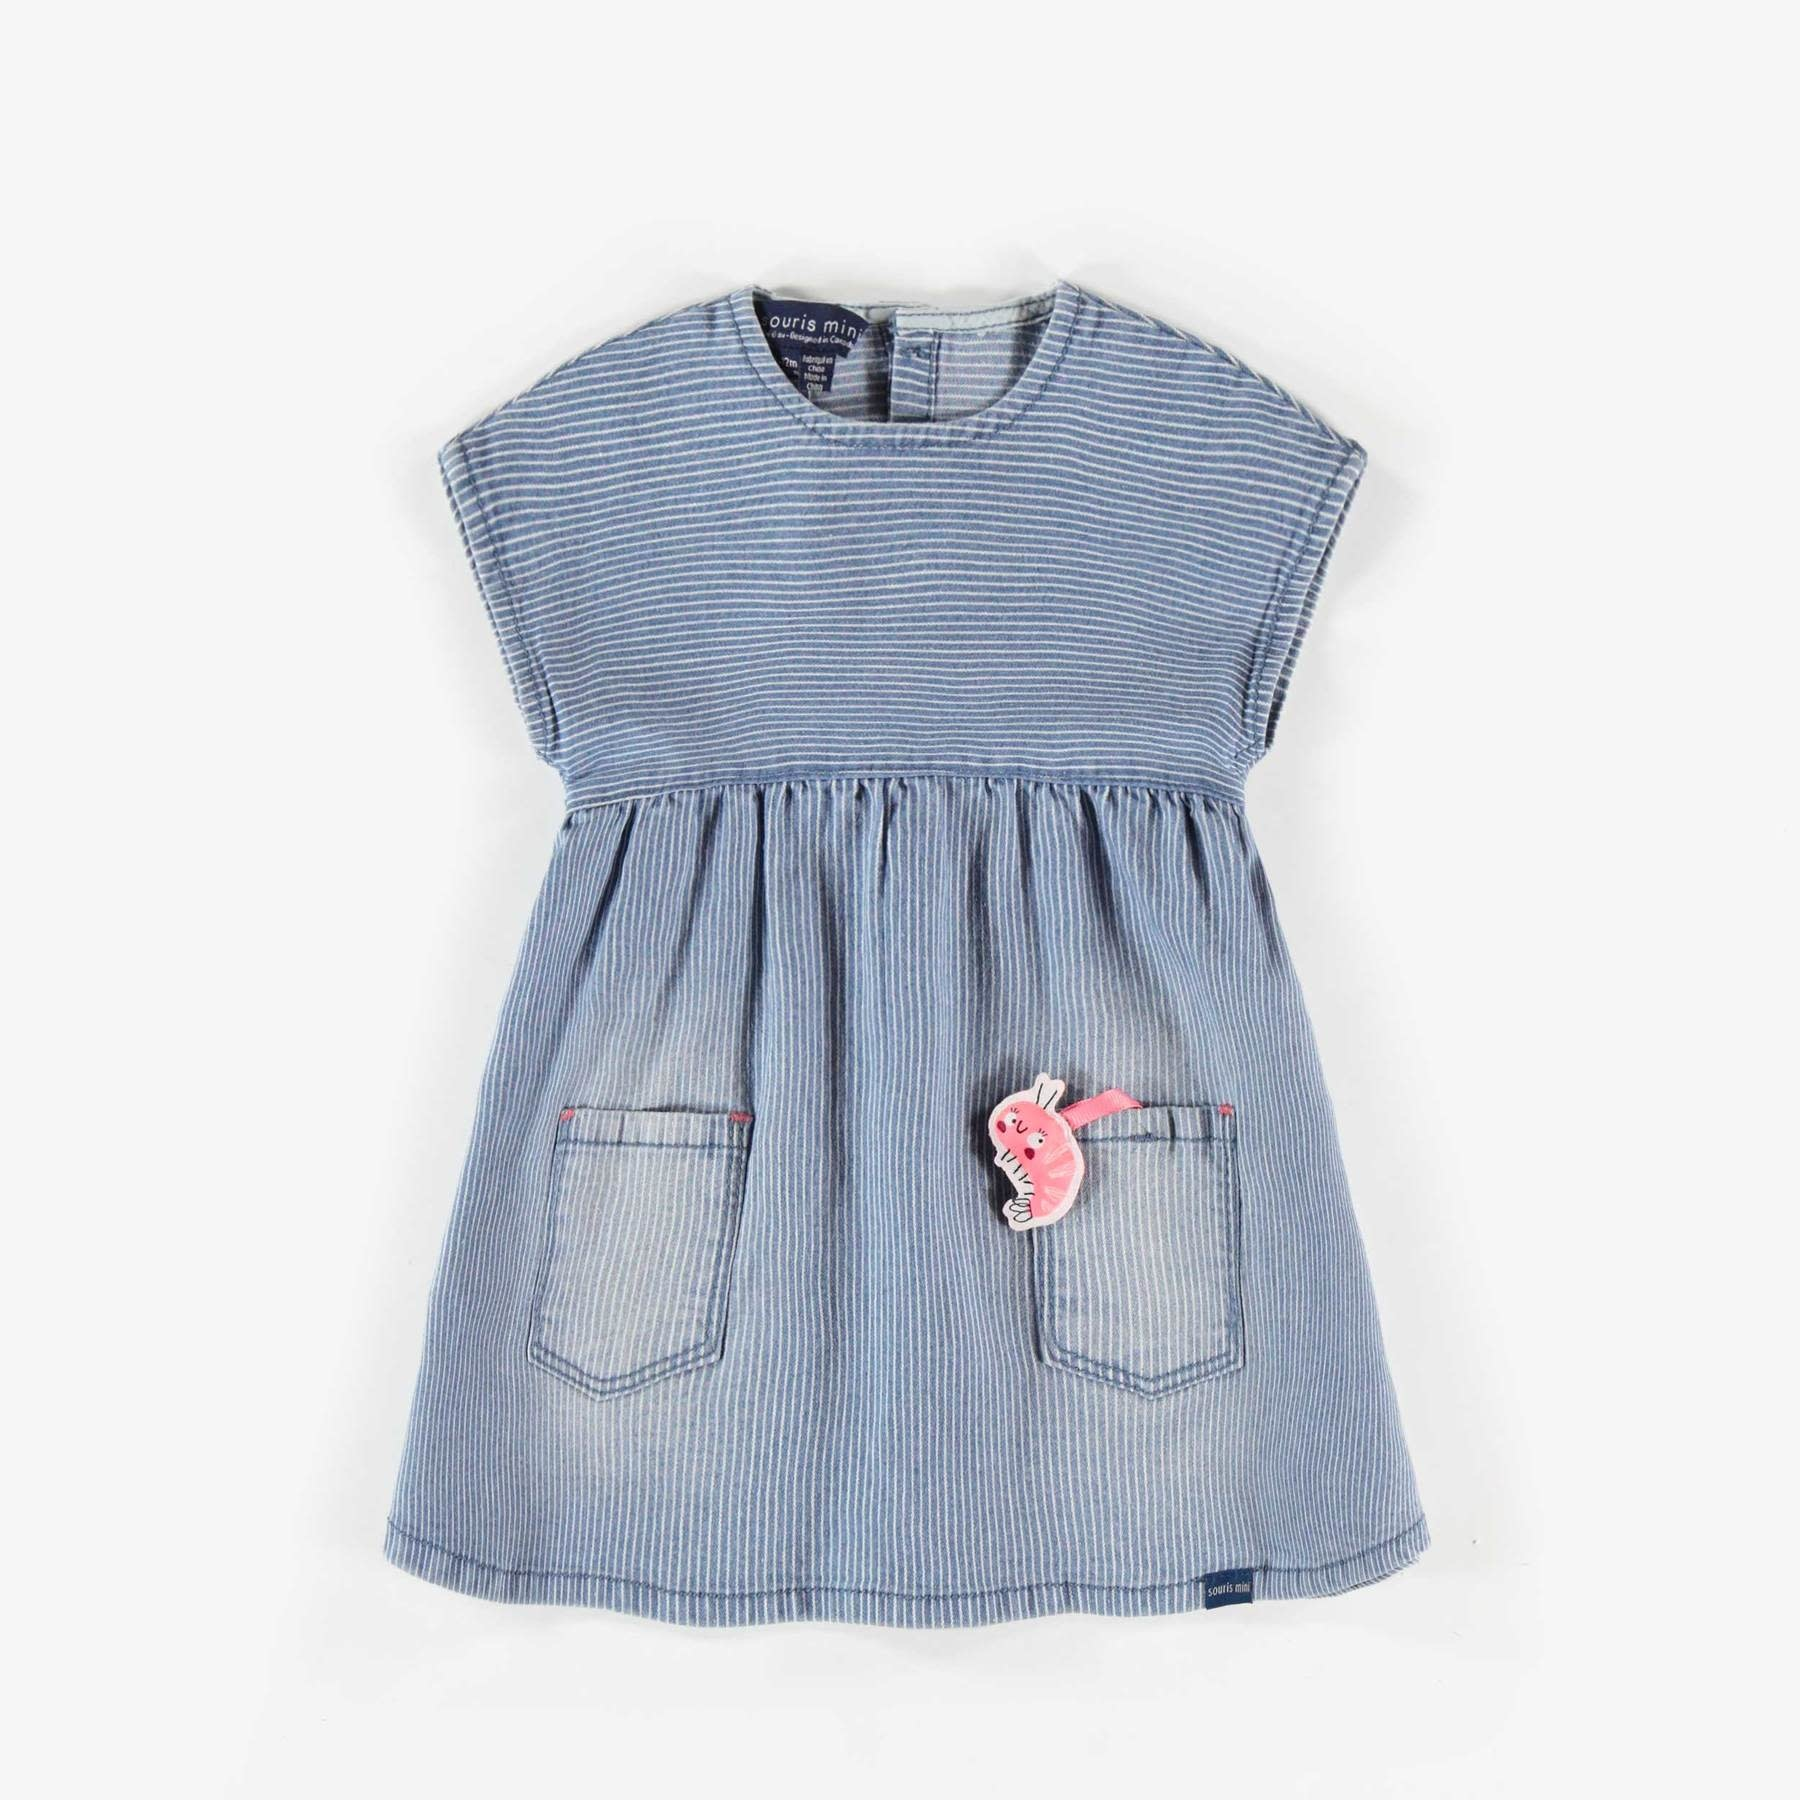 Sealife Denim Dress & Leggings - 2pc Set